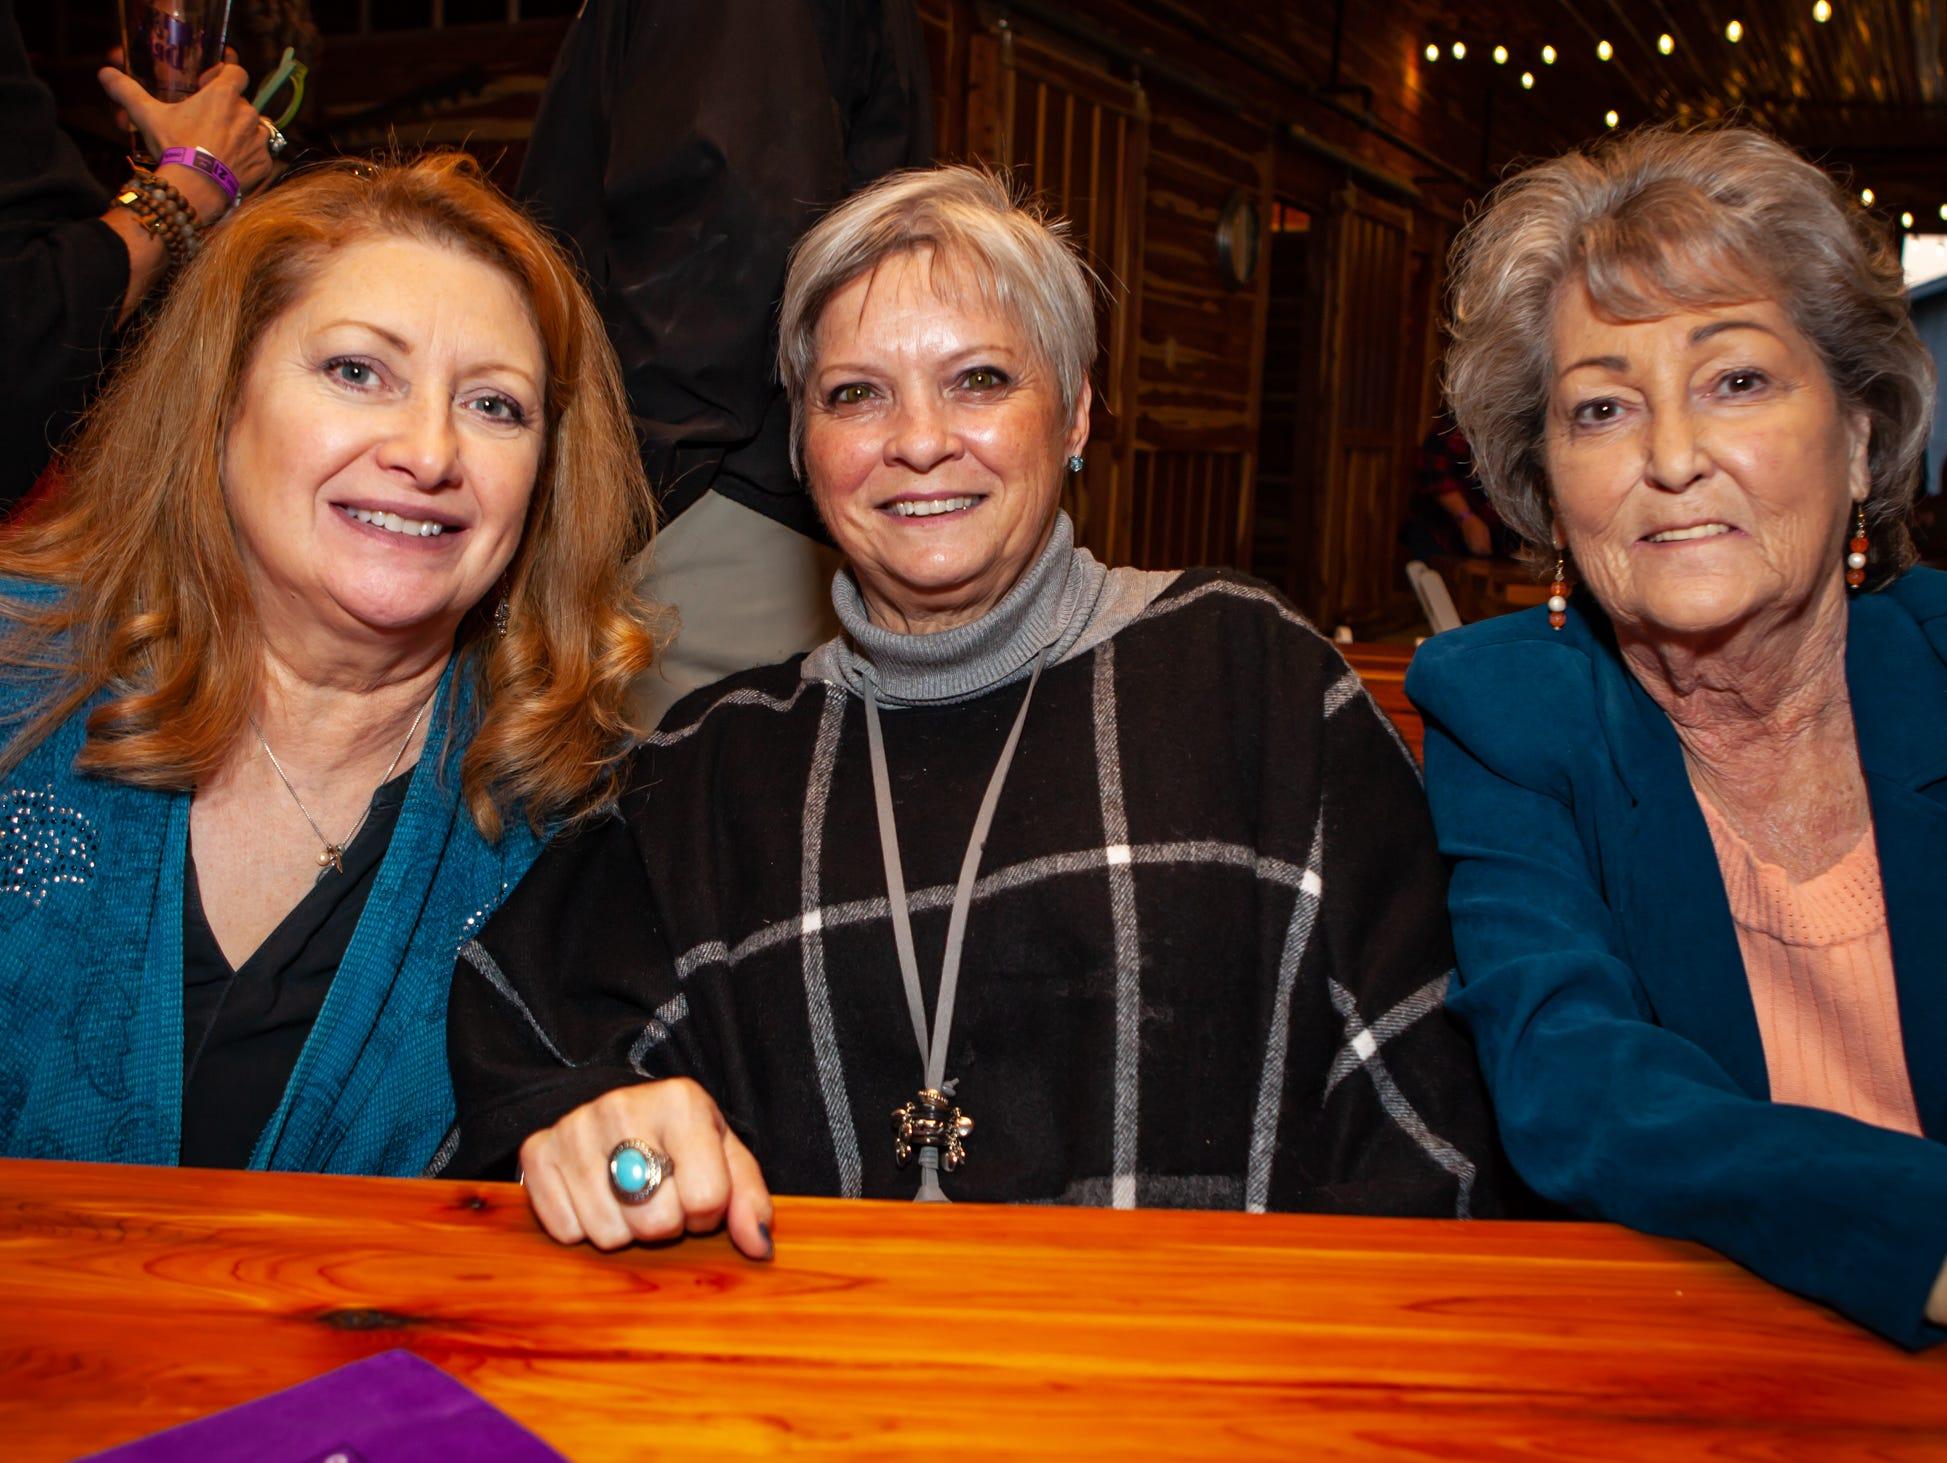 Boots and Brews: Lori Gliko, Wanda Ellithorpe and Mary Lou Claxton